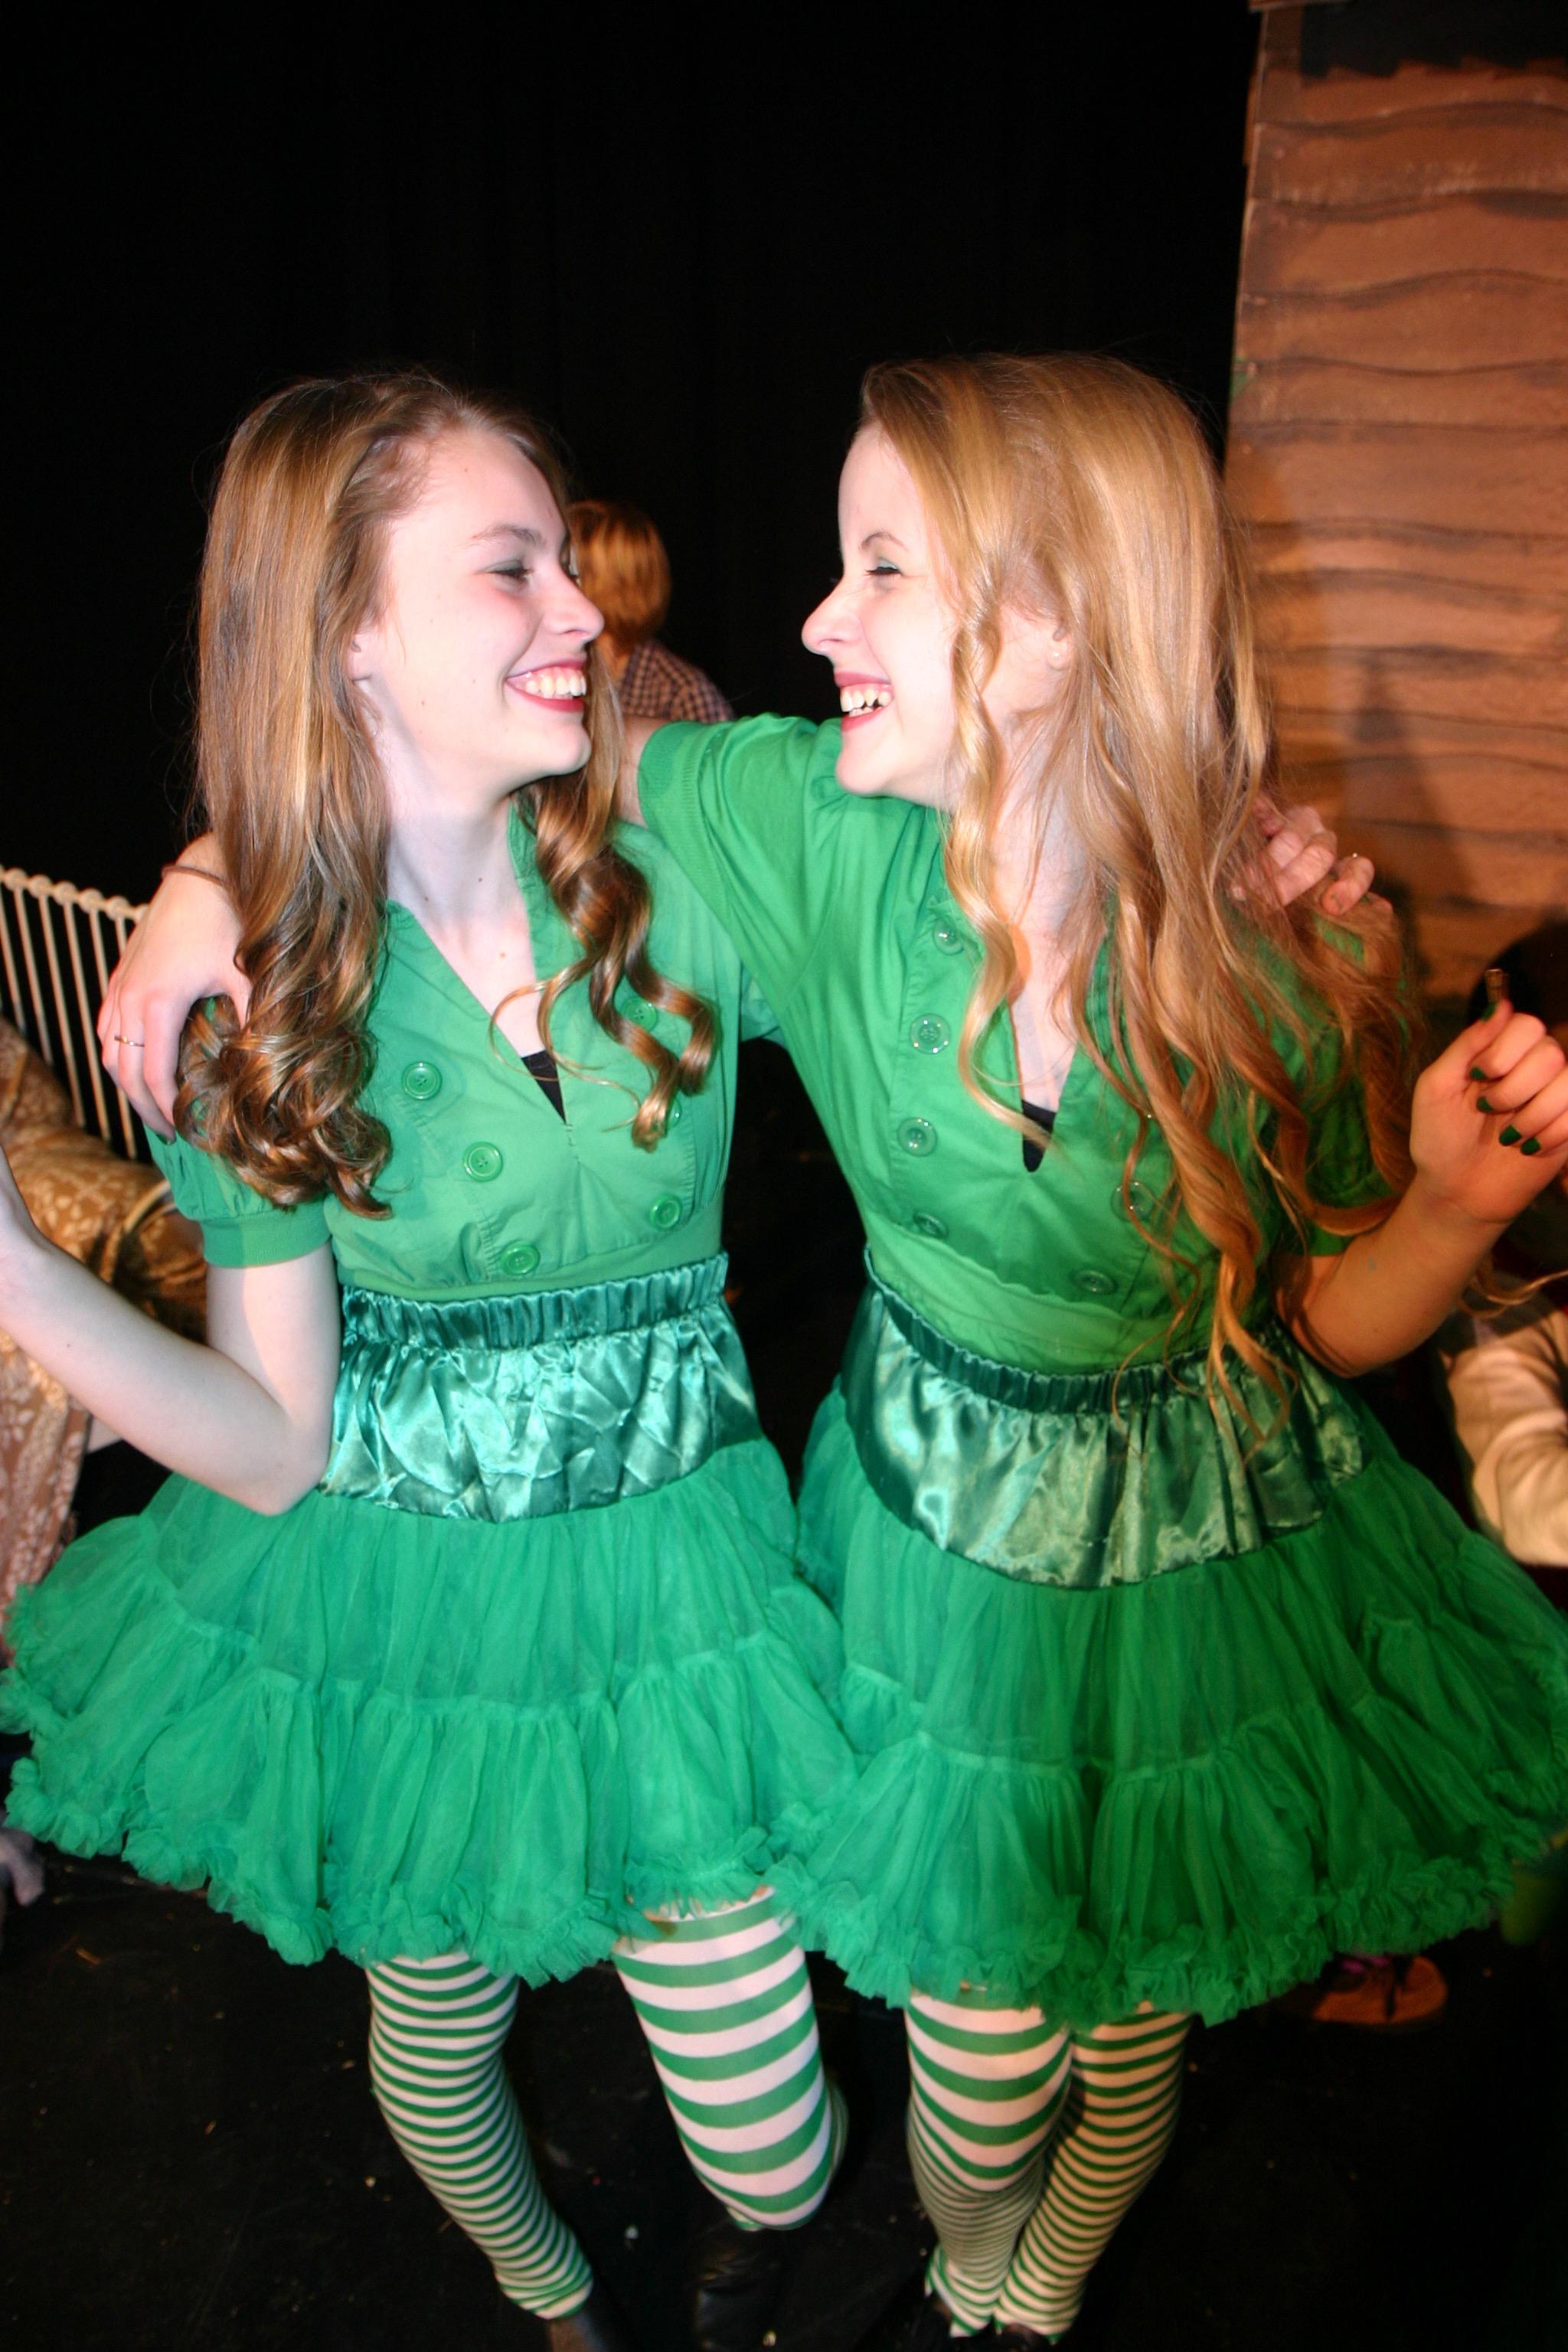 The Emerald City Girls (Emma Chandler and Gigi Cowherd)